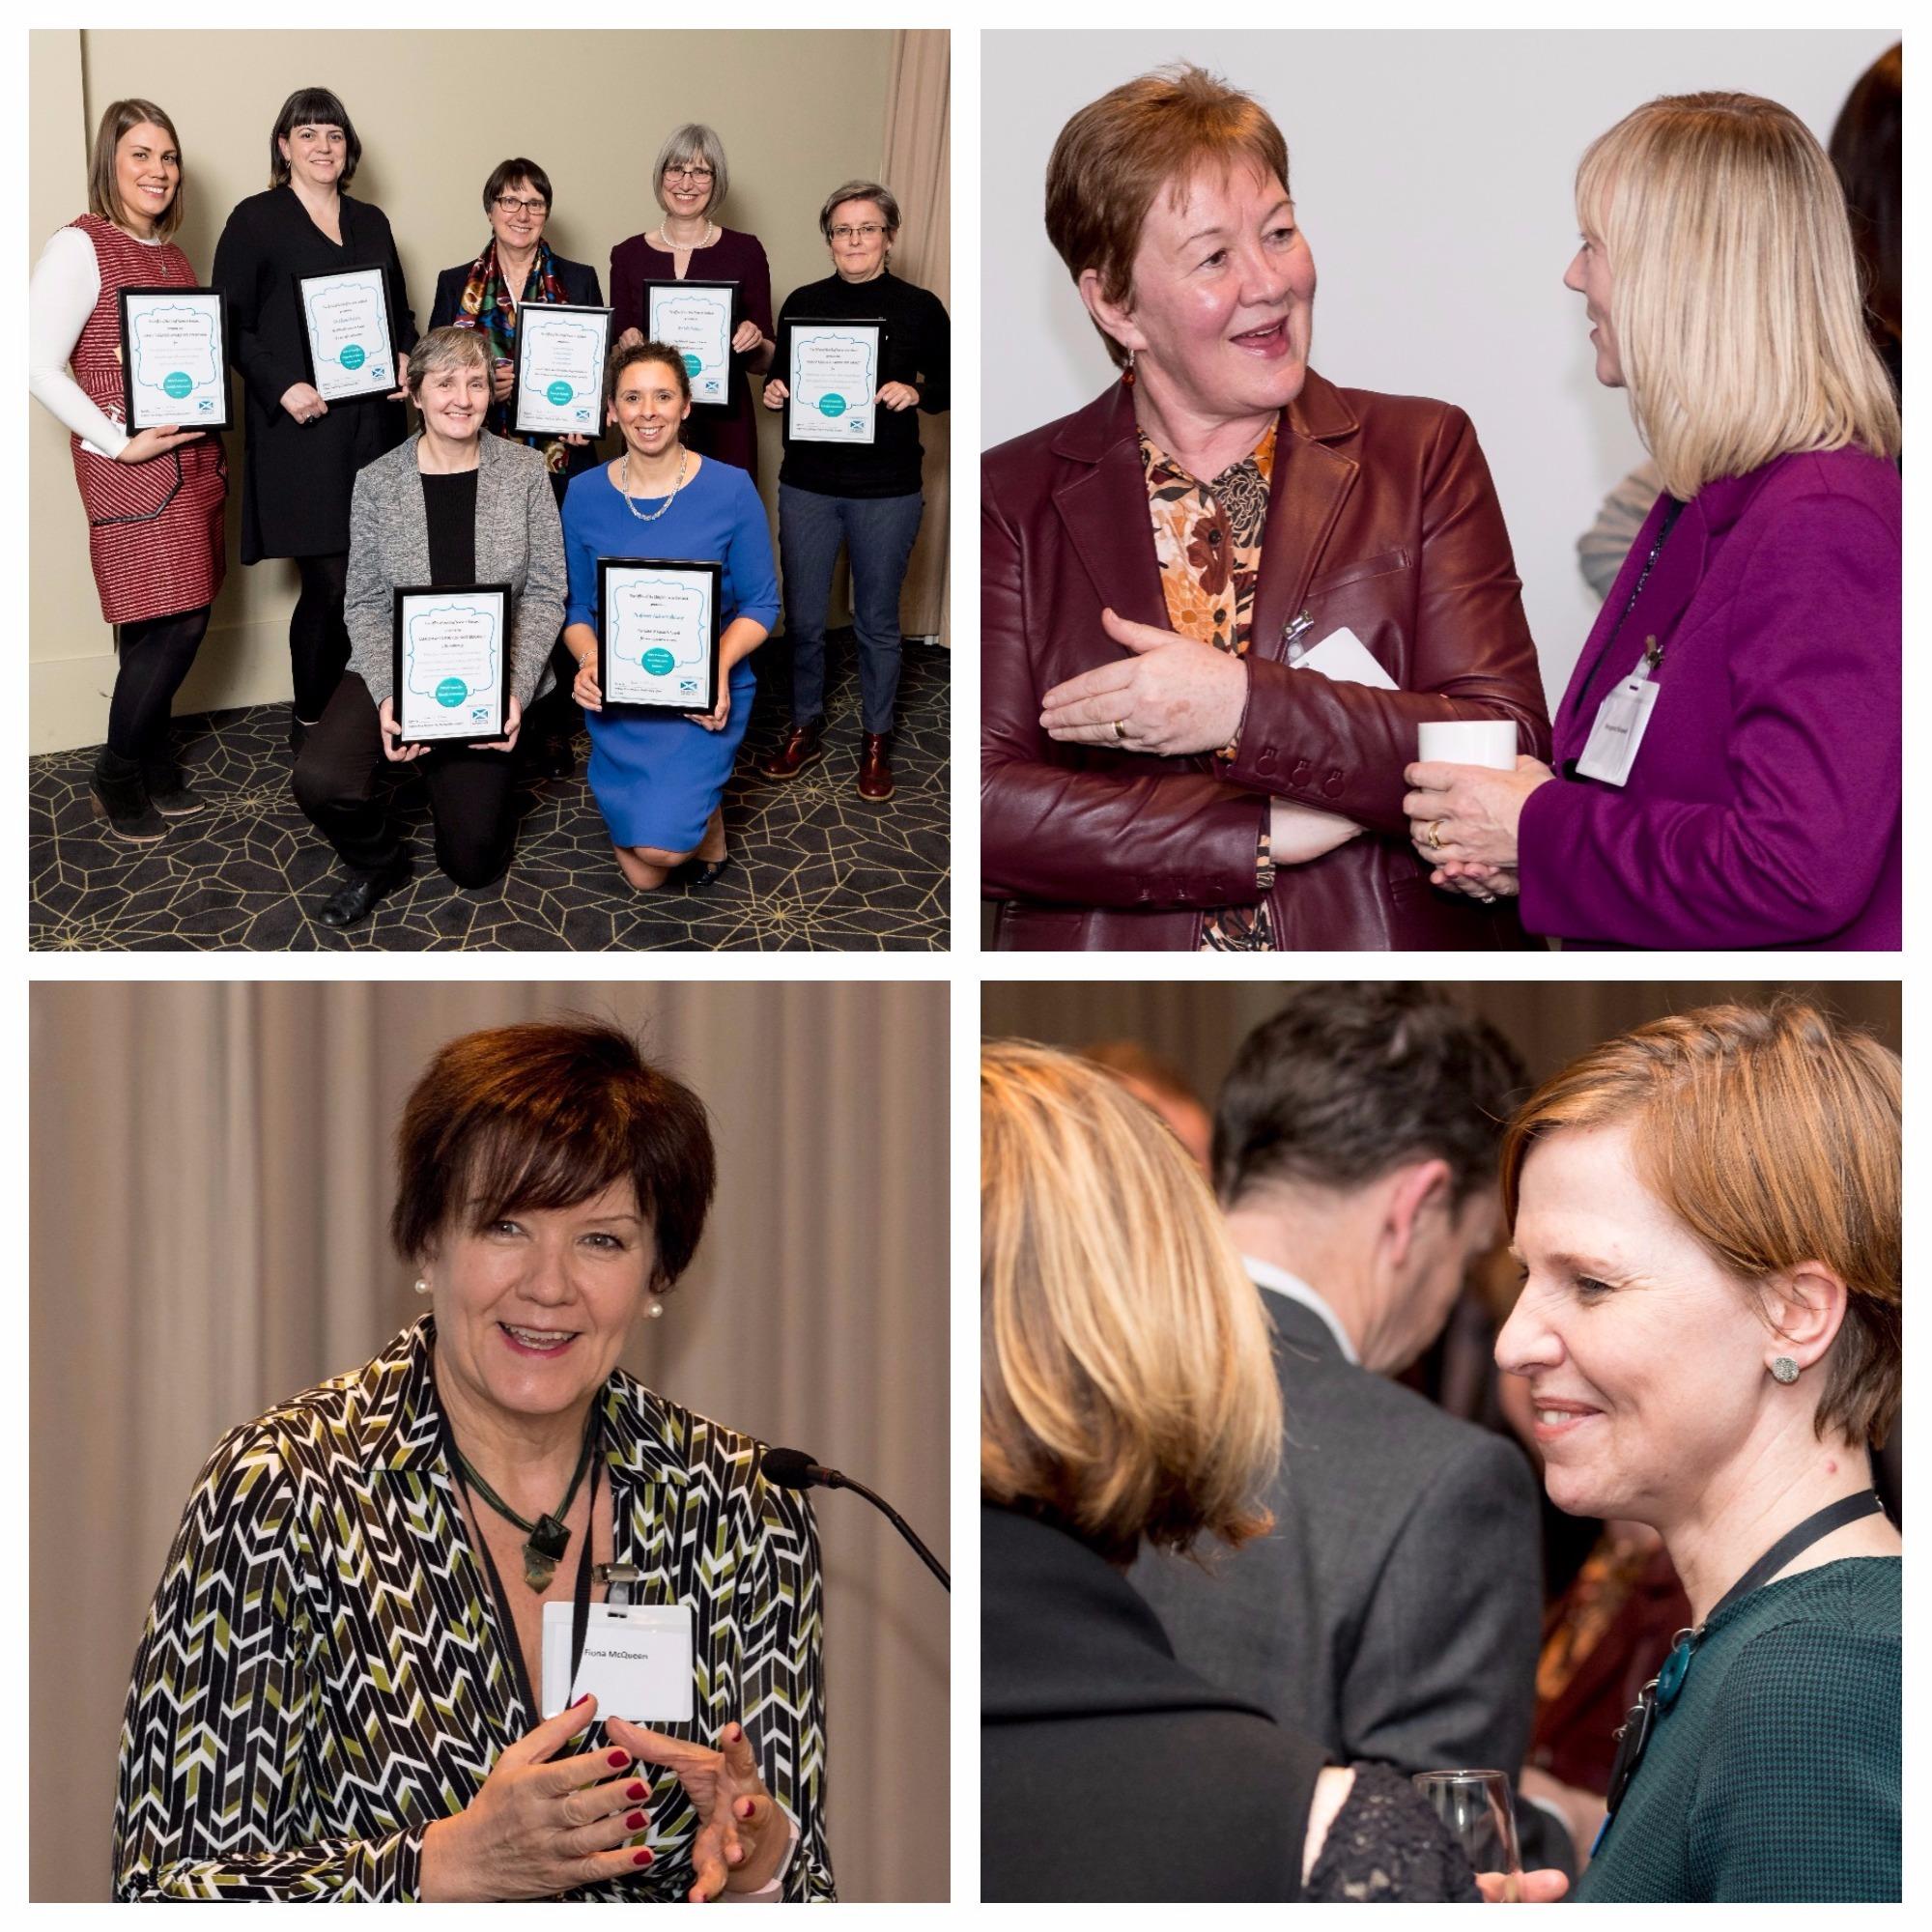 Allied Health Professions: Scottish Nursing, Midwifery And Allied Health Professions